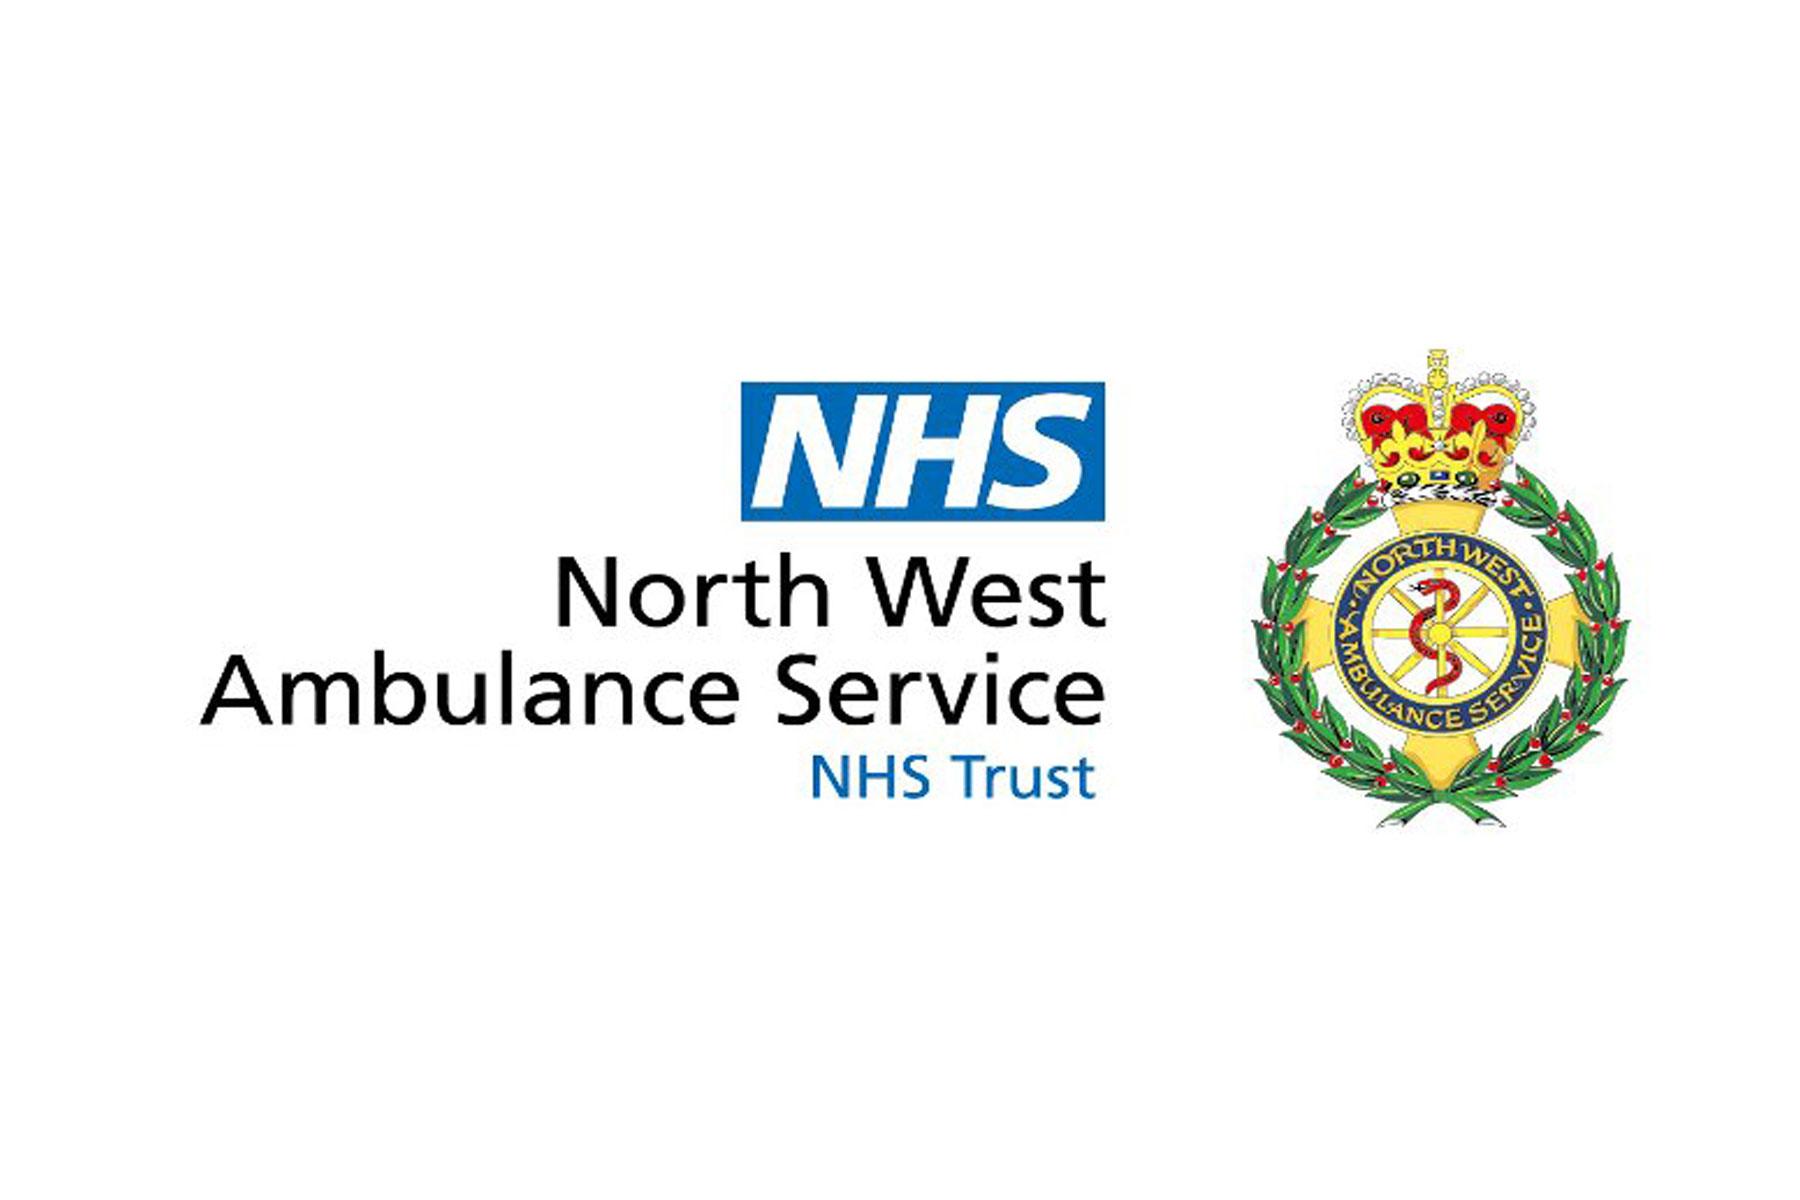 North West Ambulance Service logo